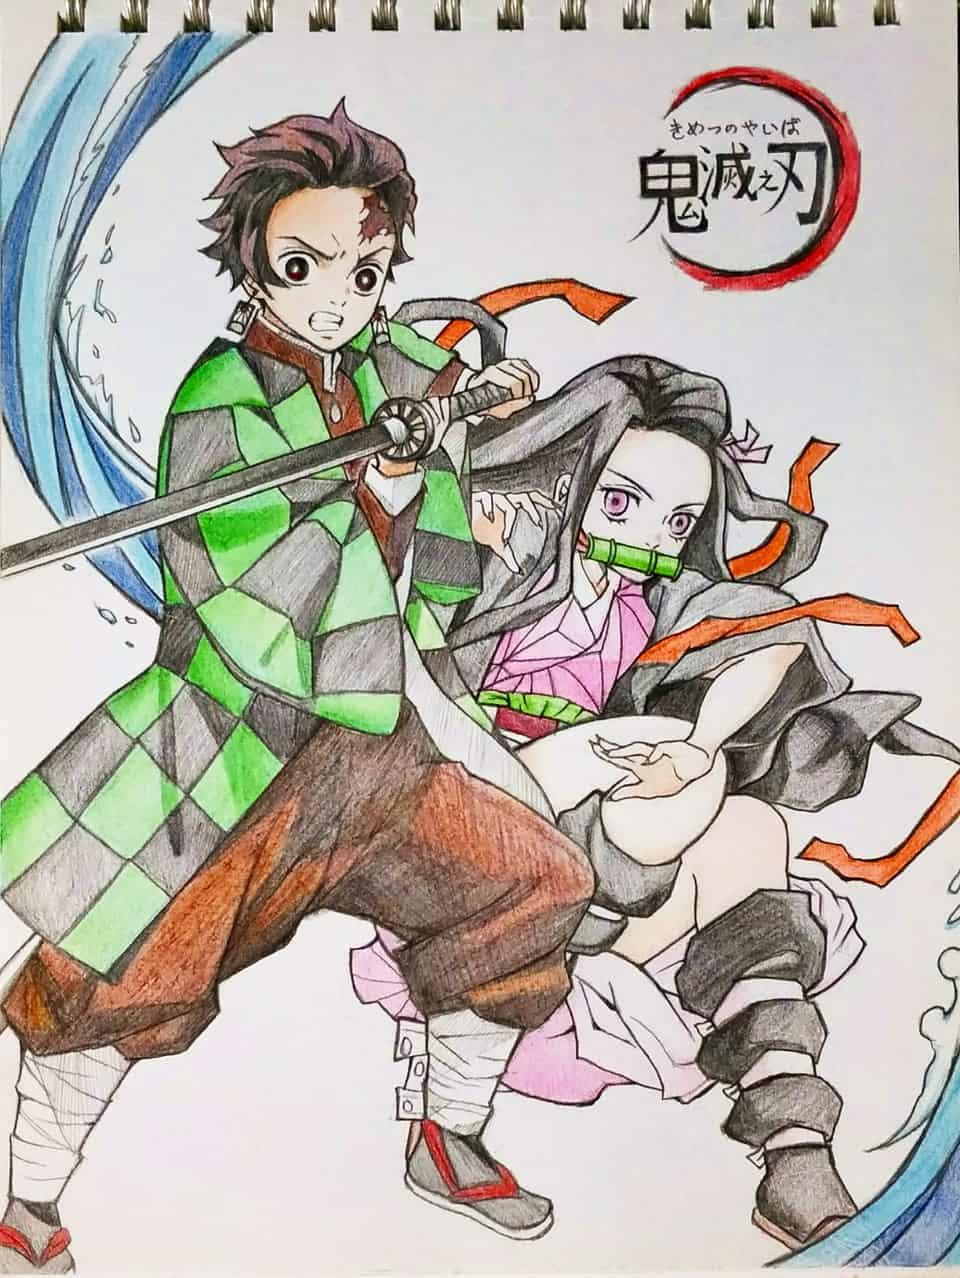 彩虹筆-炭治郎&禰豆子 Illust of 大蔥 DemonSlayerFanartContest KamadoTanjirou KimetsunoYaiba KamadoNezuko